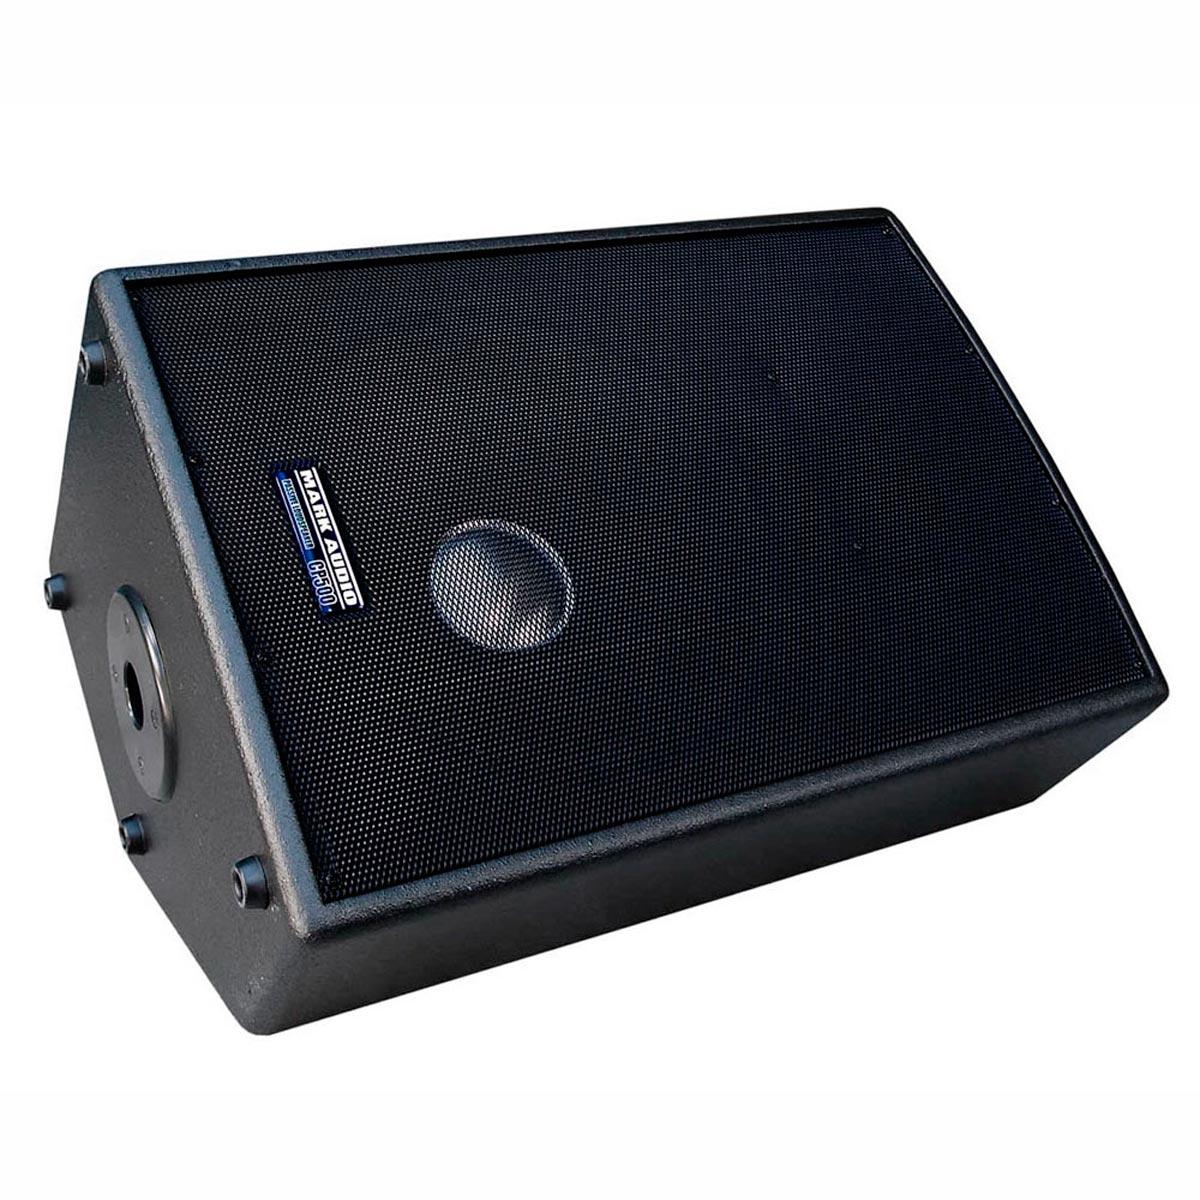 CP500 - Caixa Passiva 100W CP 500 - Mark Audio